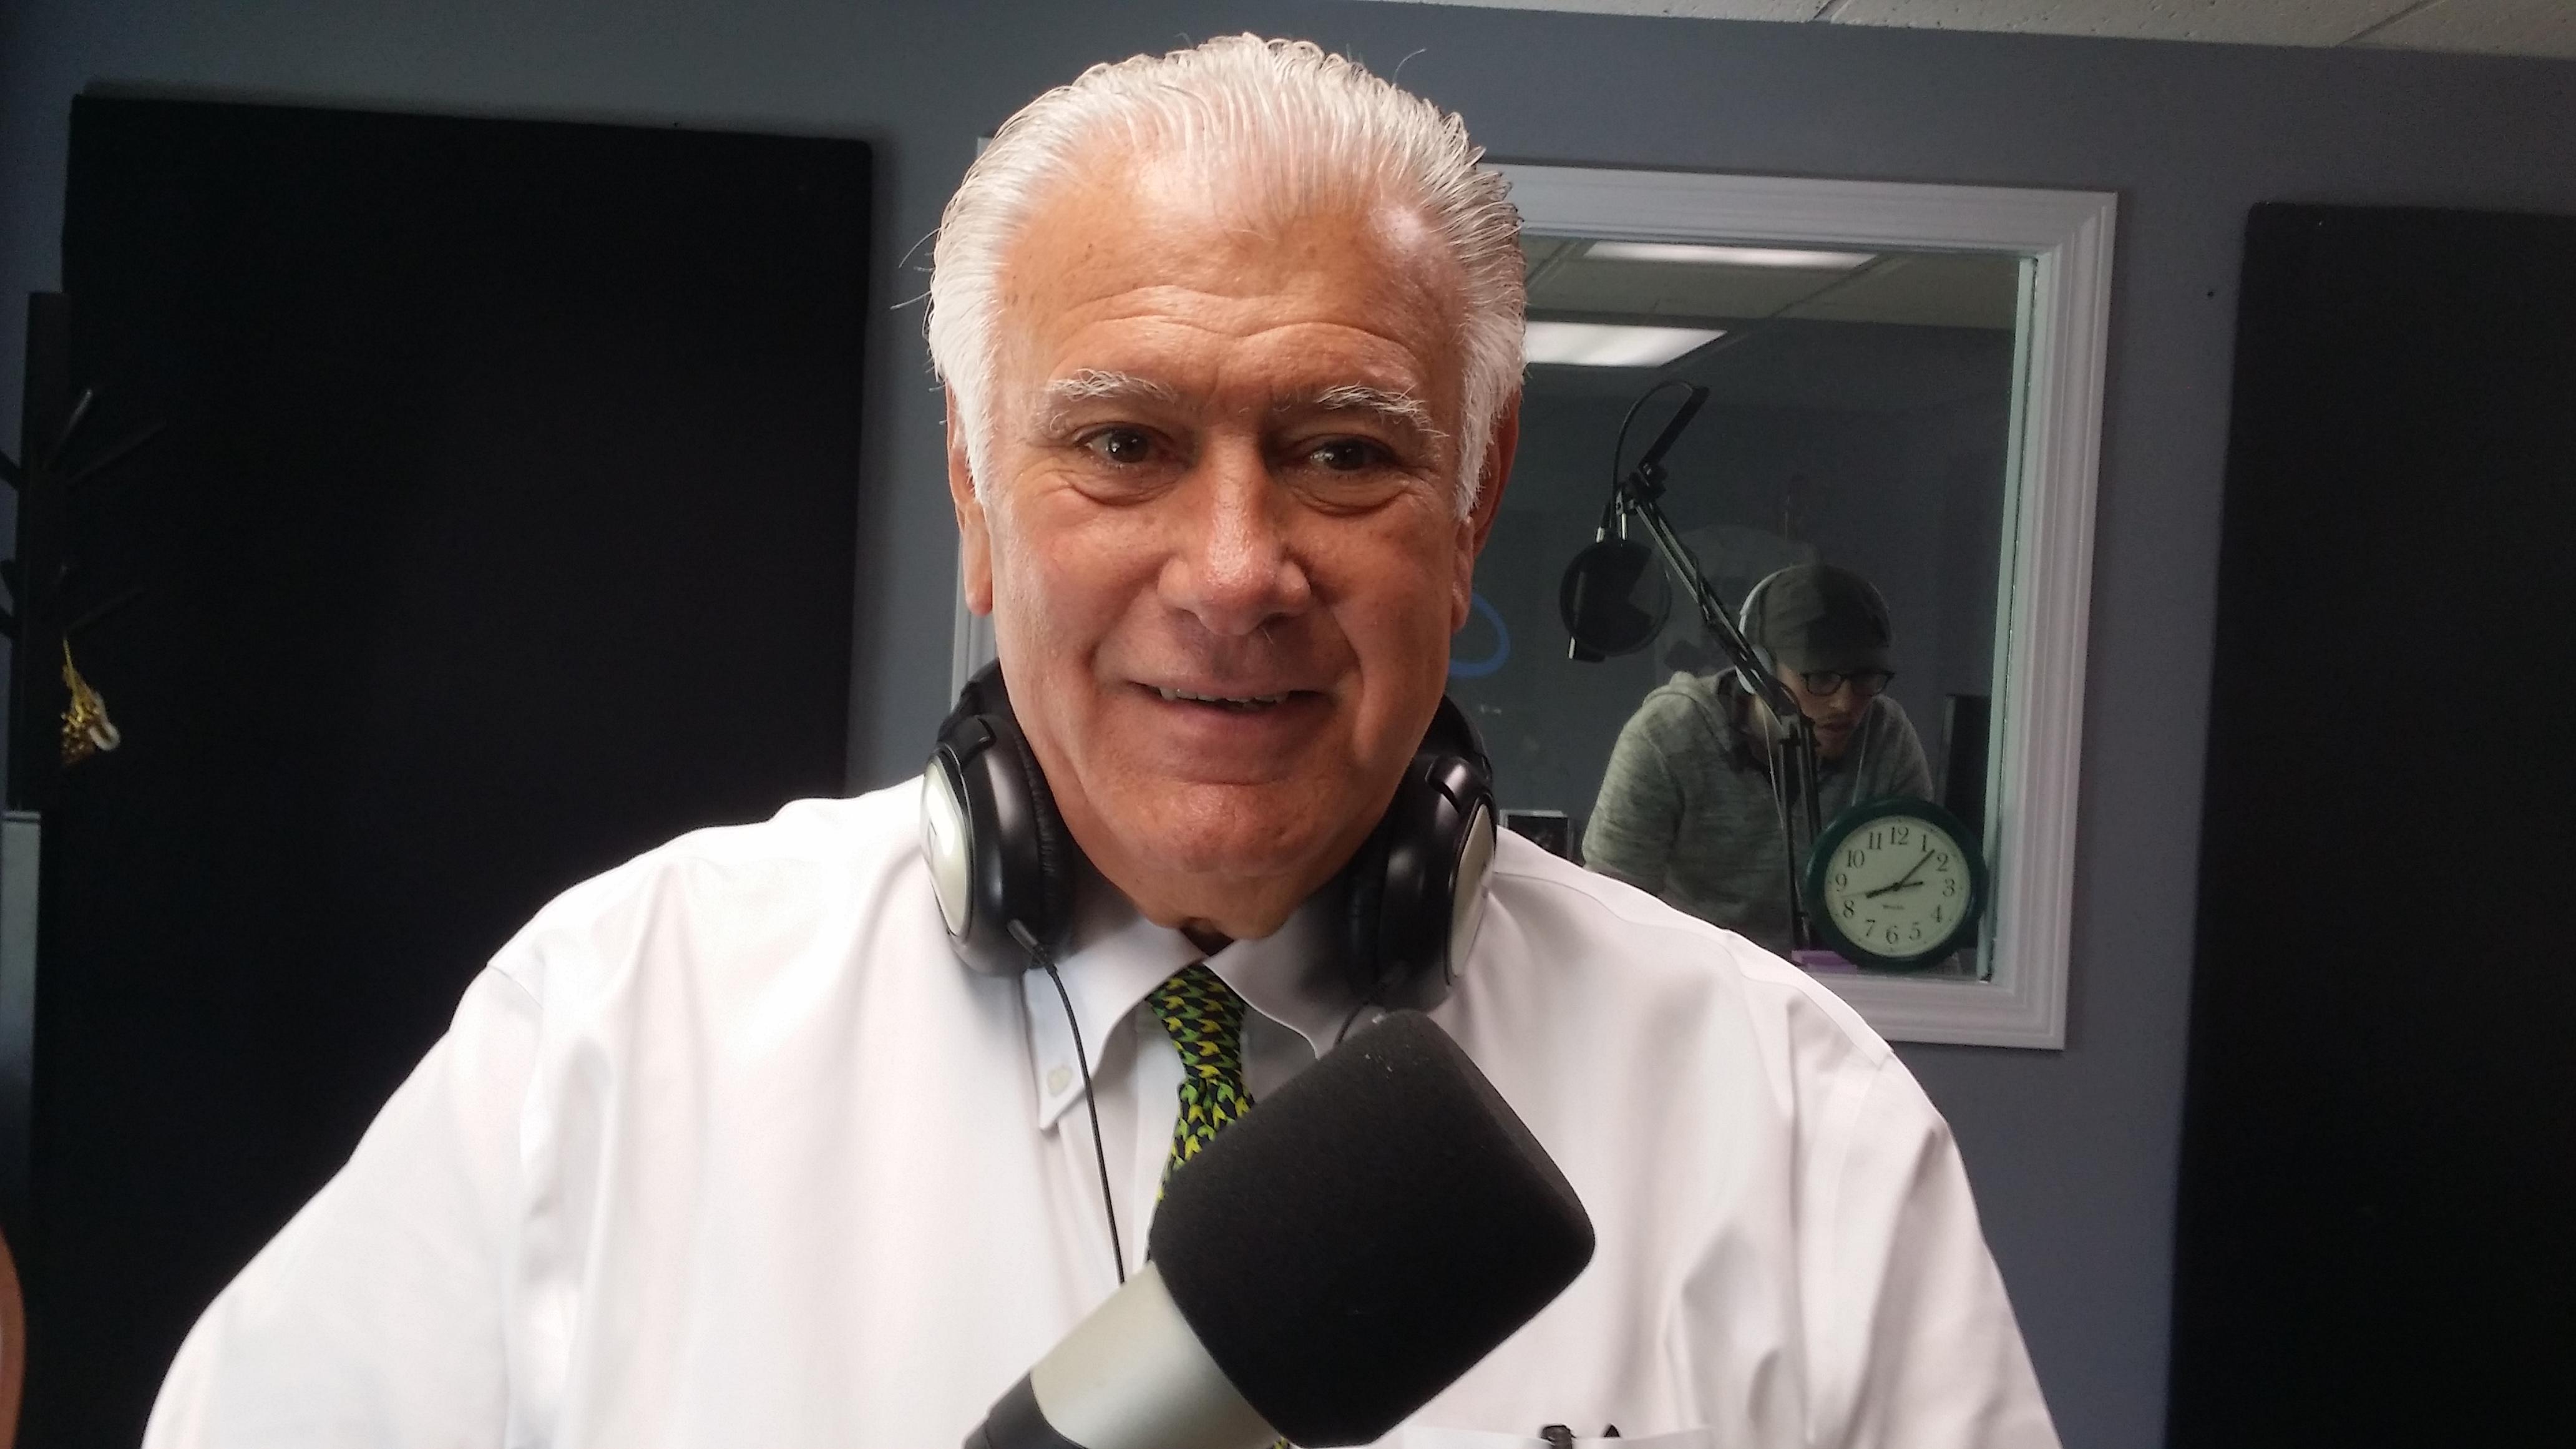 Mayor Ted Gatsas and the Upcoming Election Season